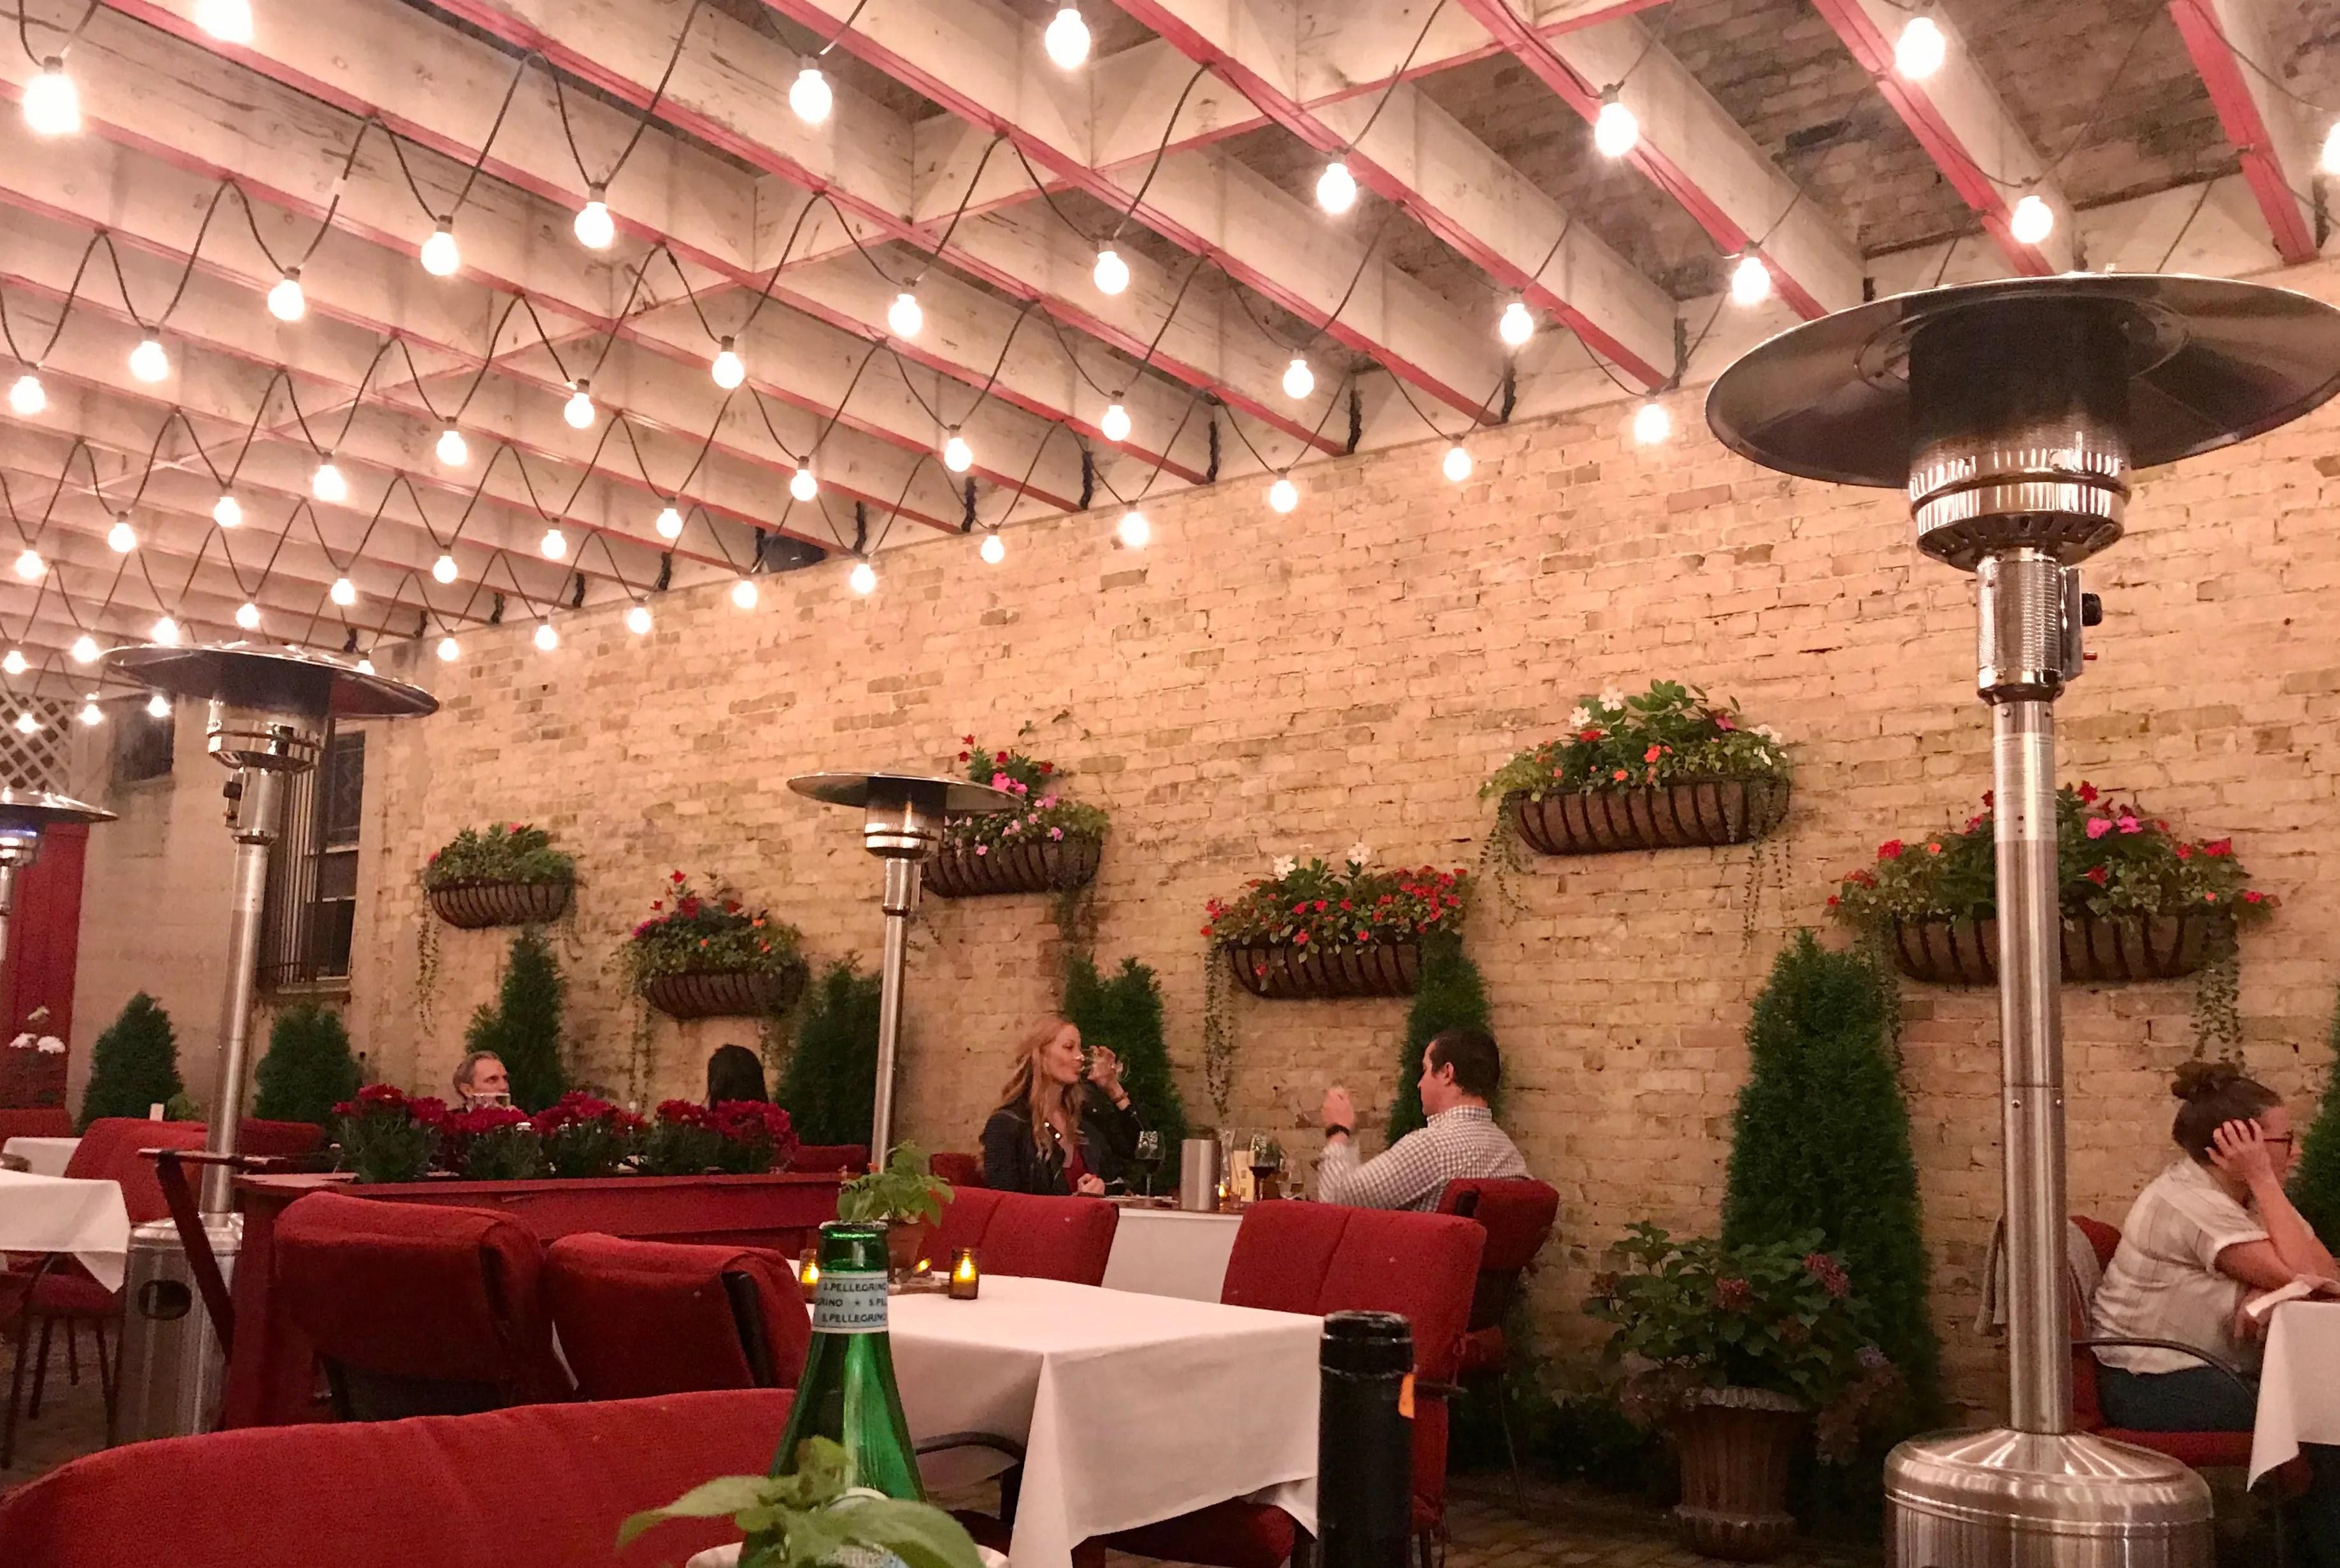 milwaukee heated patios allow outdoor